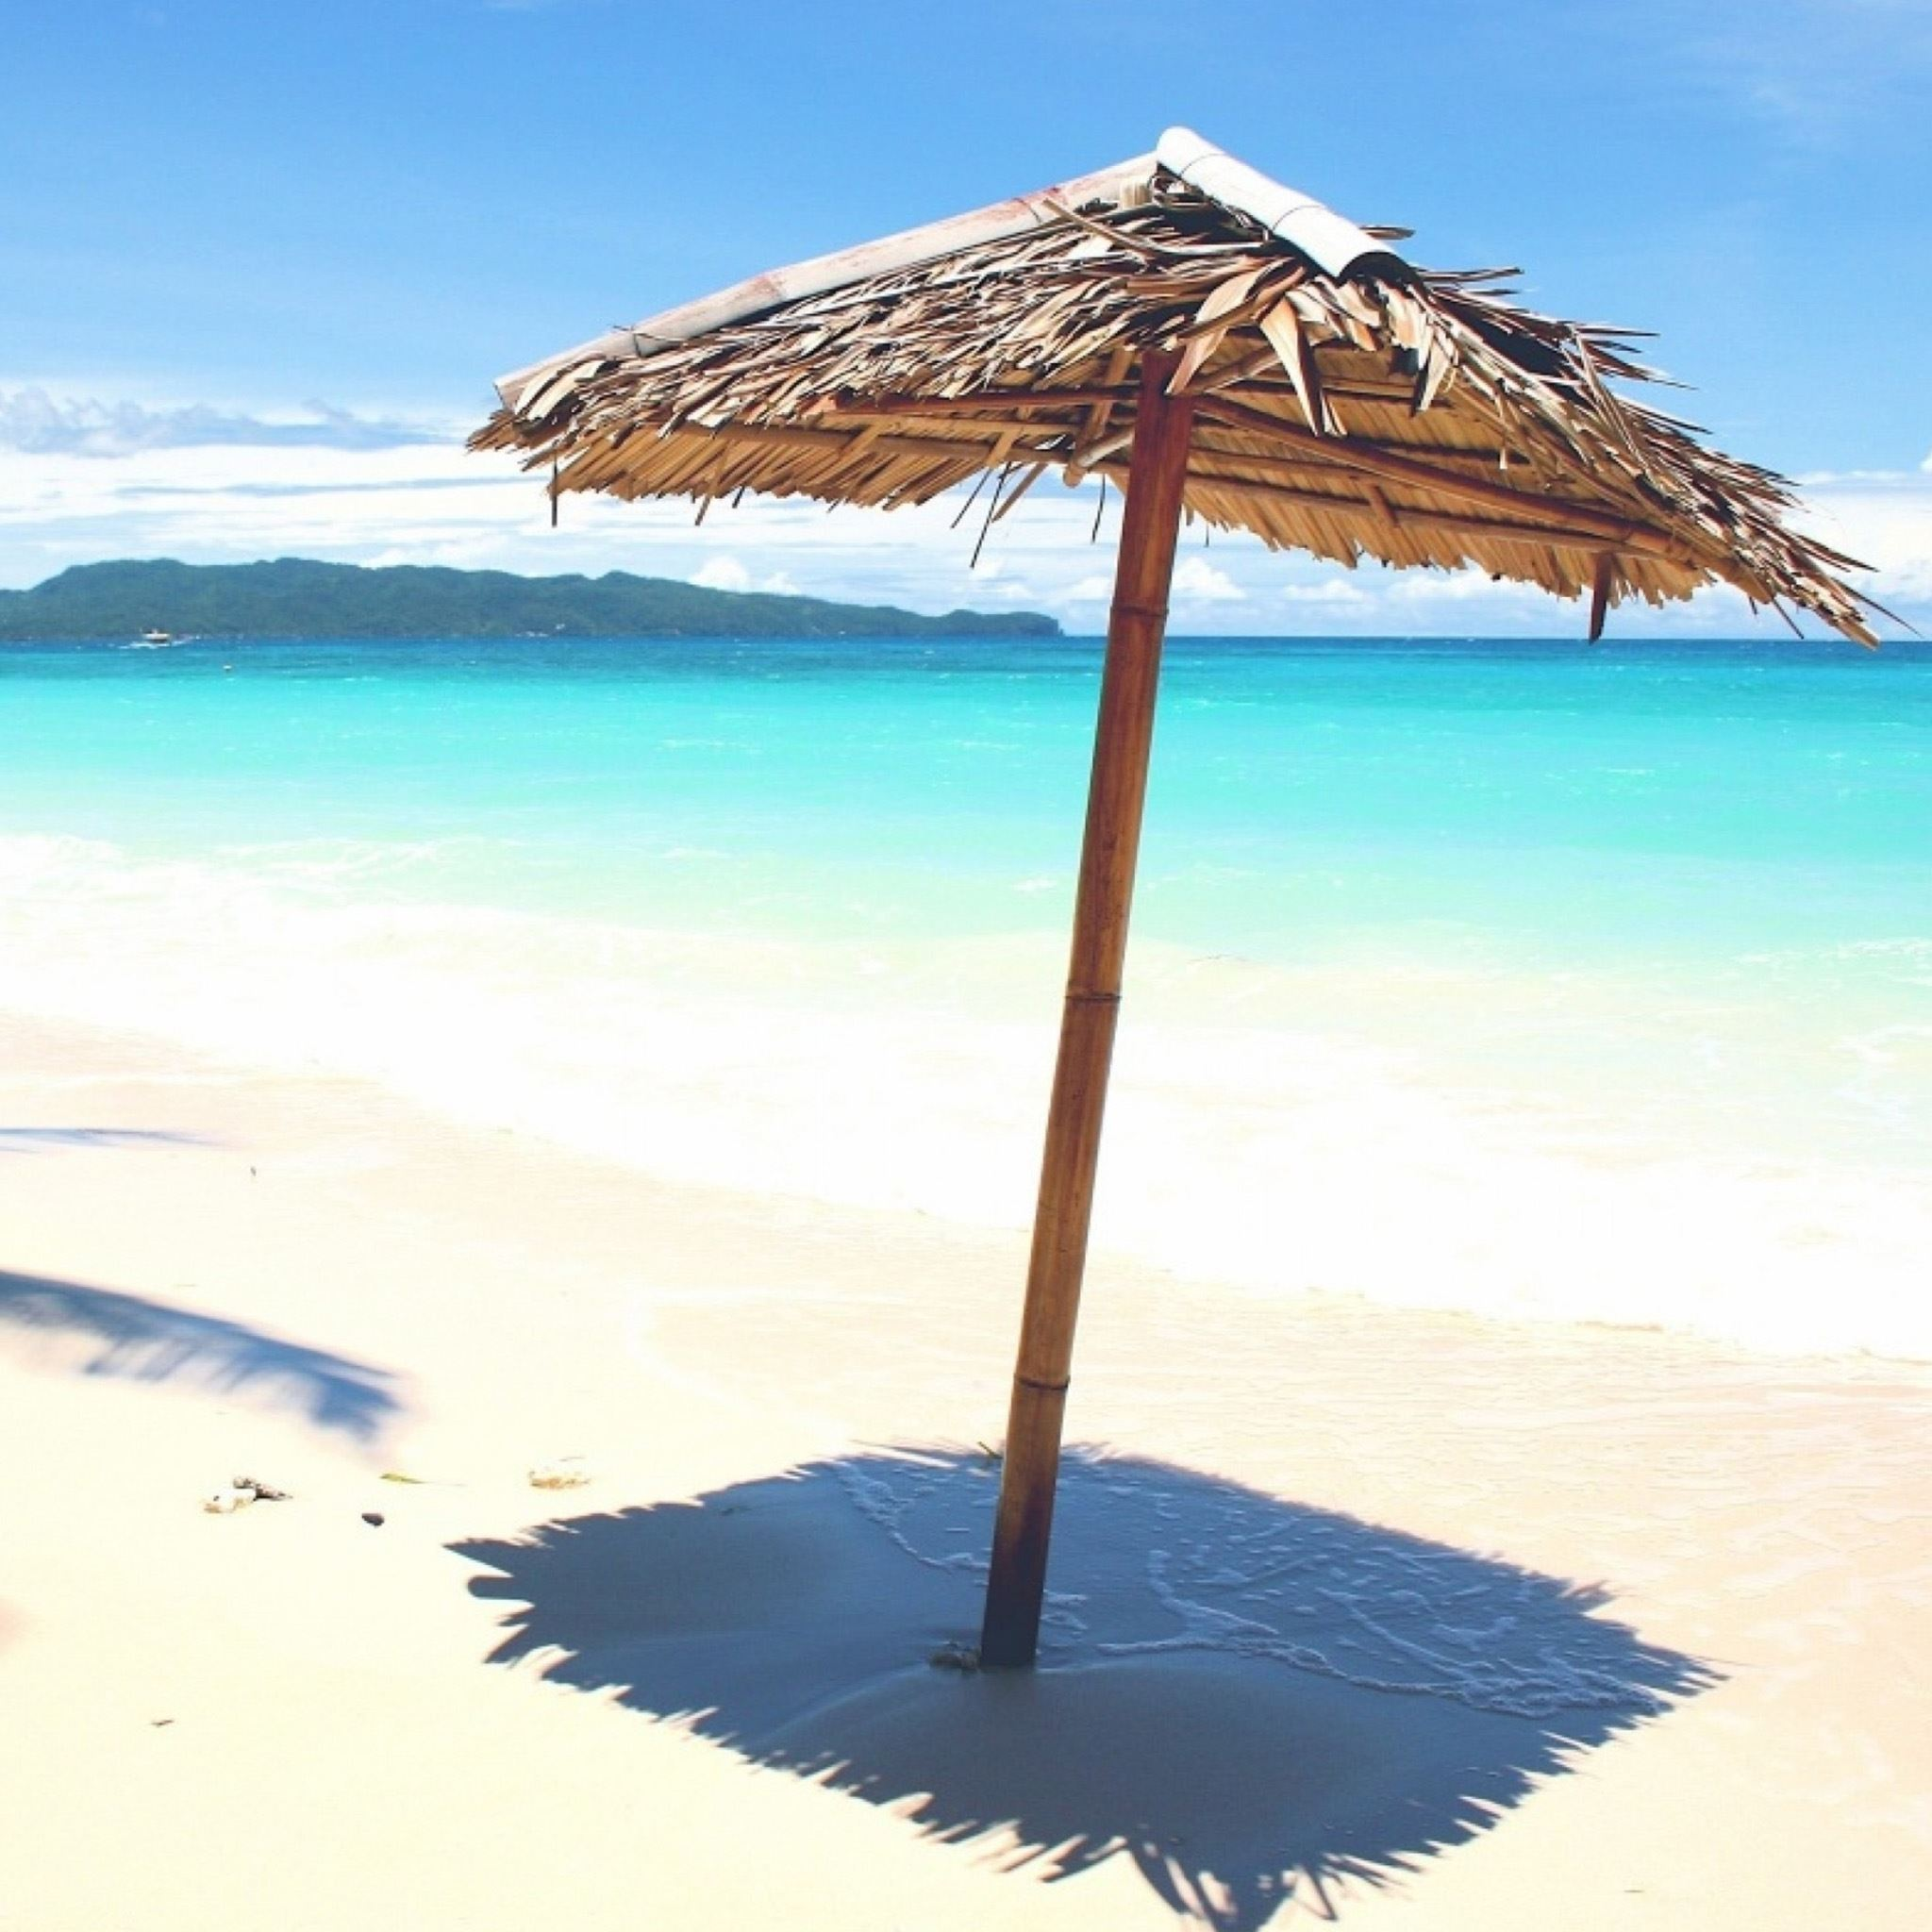 Sandy Beach Umbrella iPad Air wallpaper